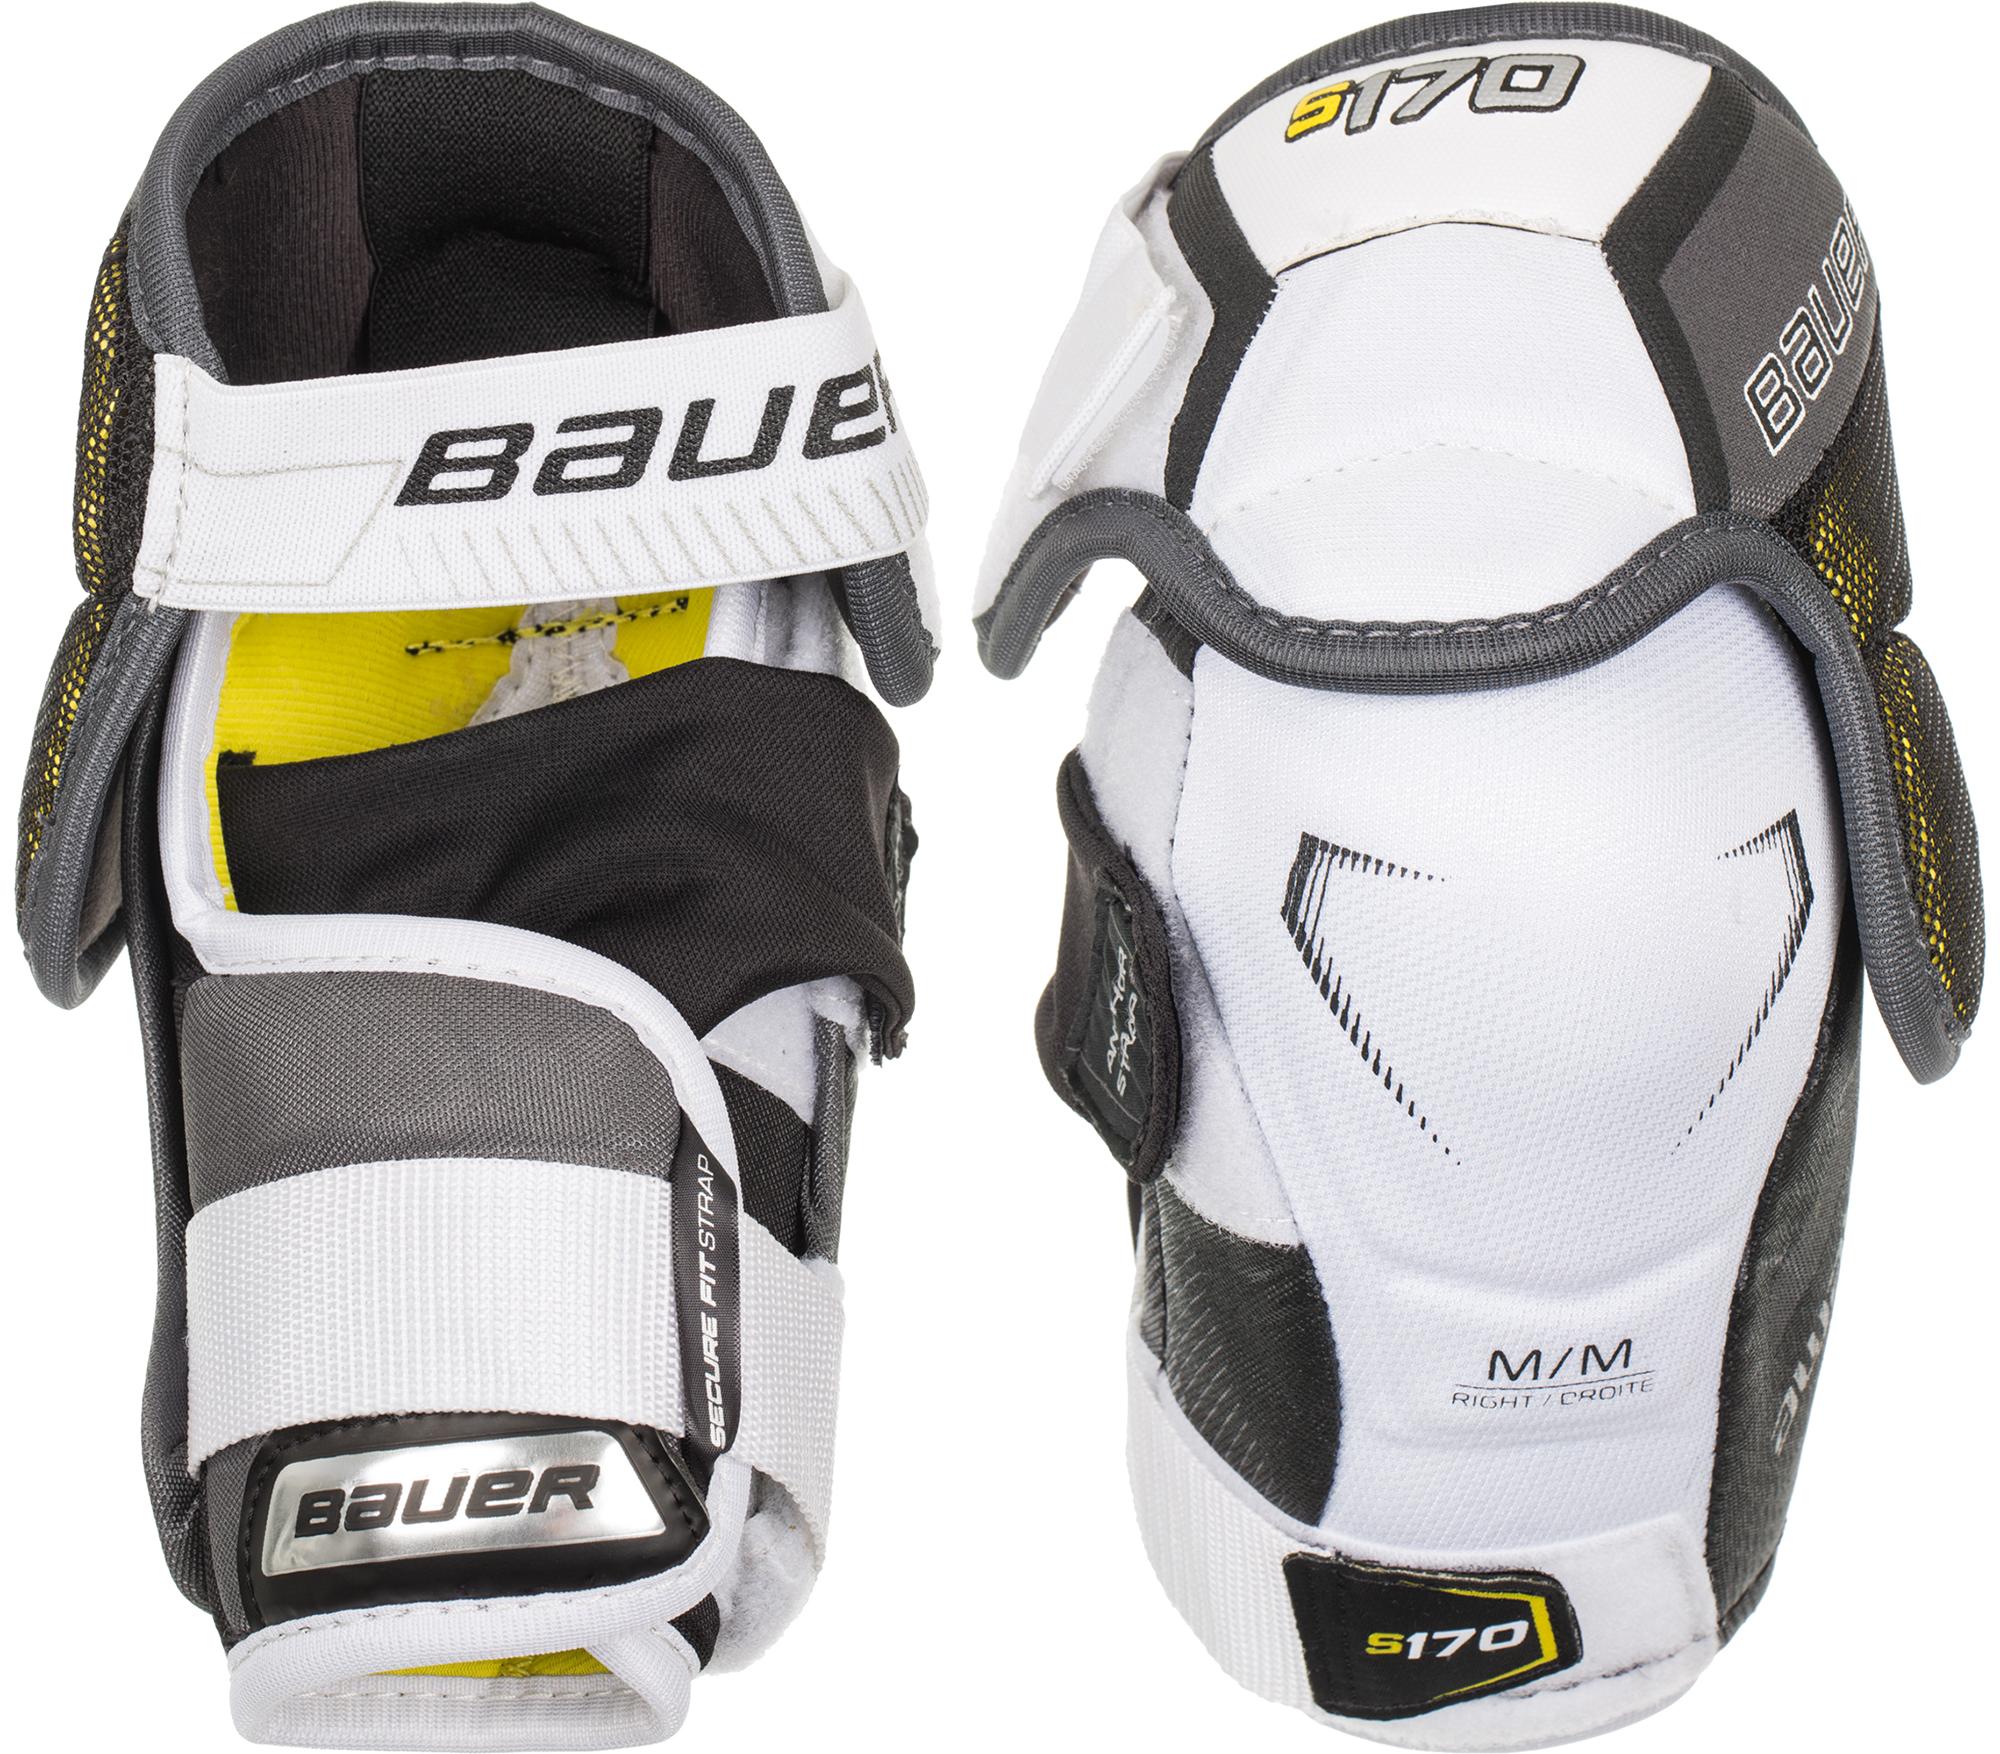 Bauer Налокотники хоккейные Bauer S17 Supreme S170